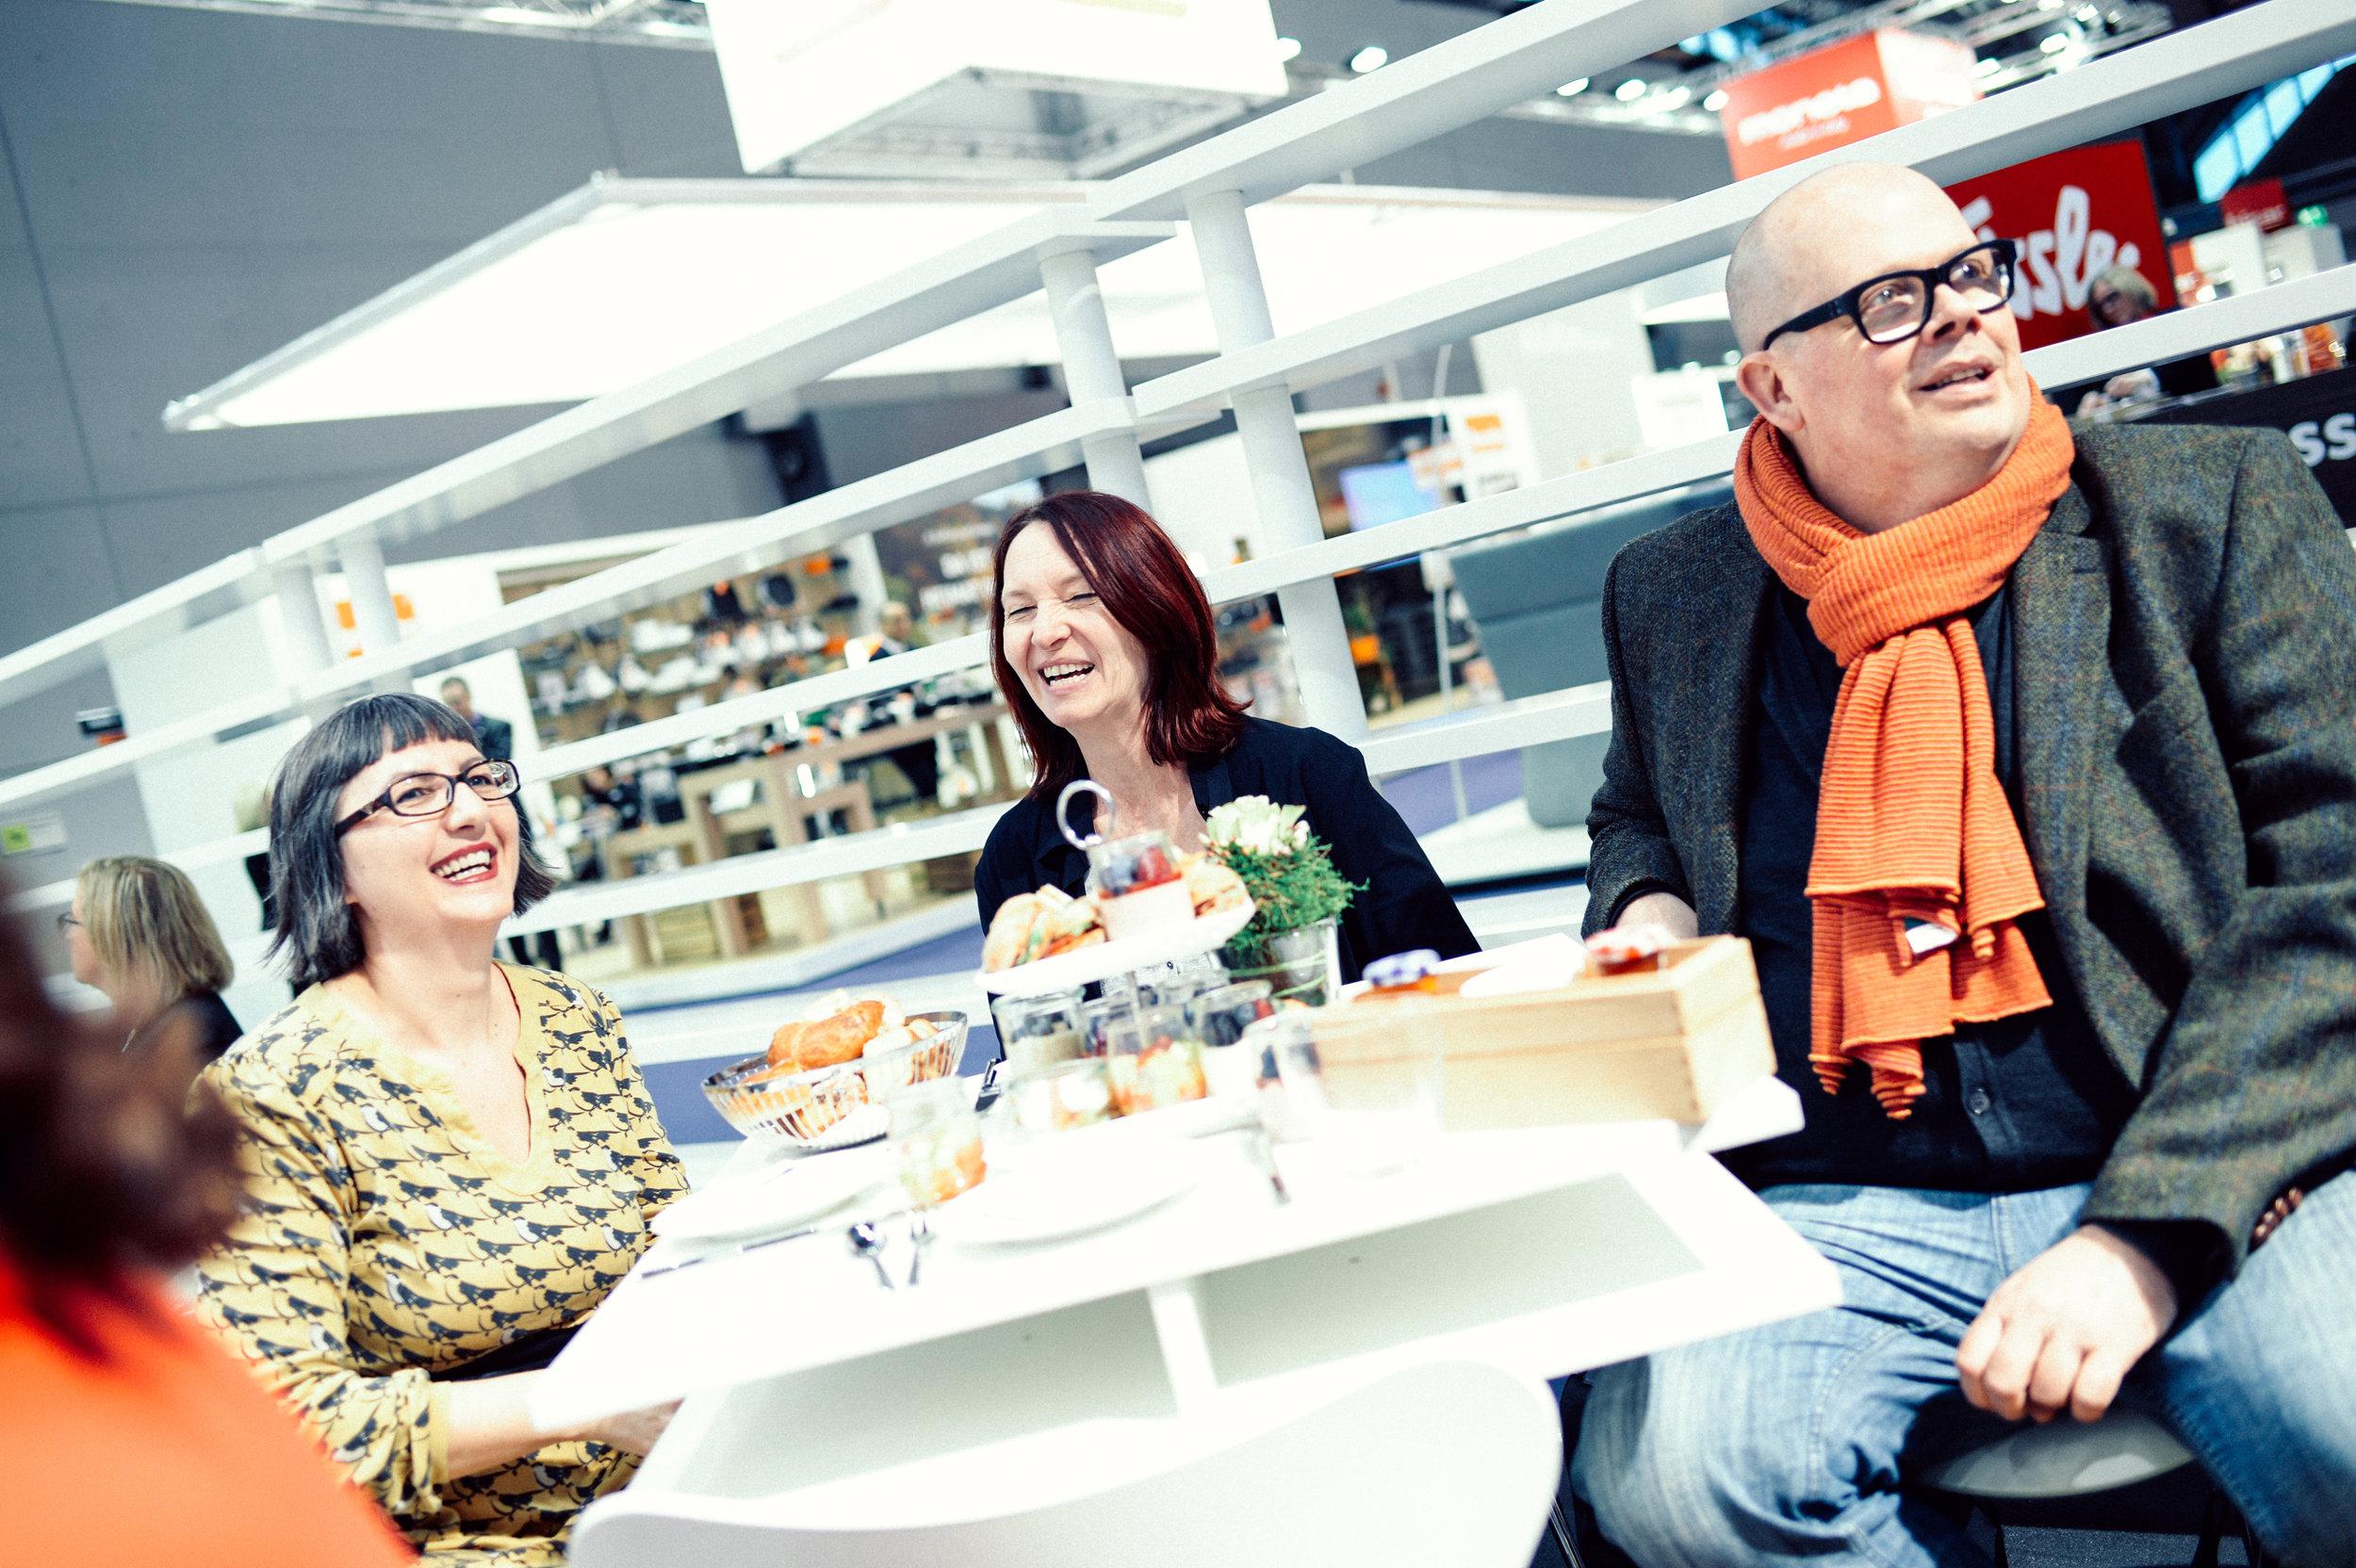 german_food_blog_contest-3.jpg